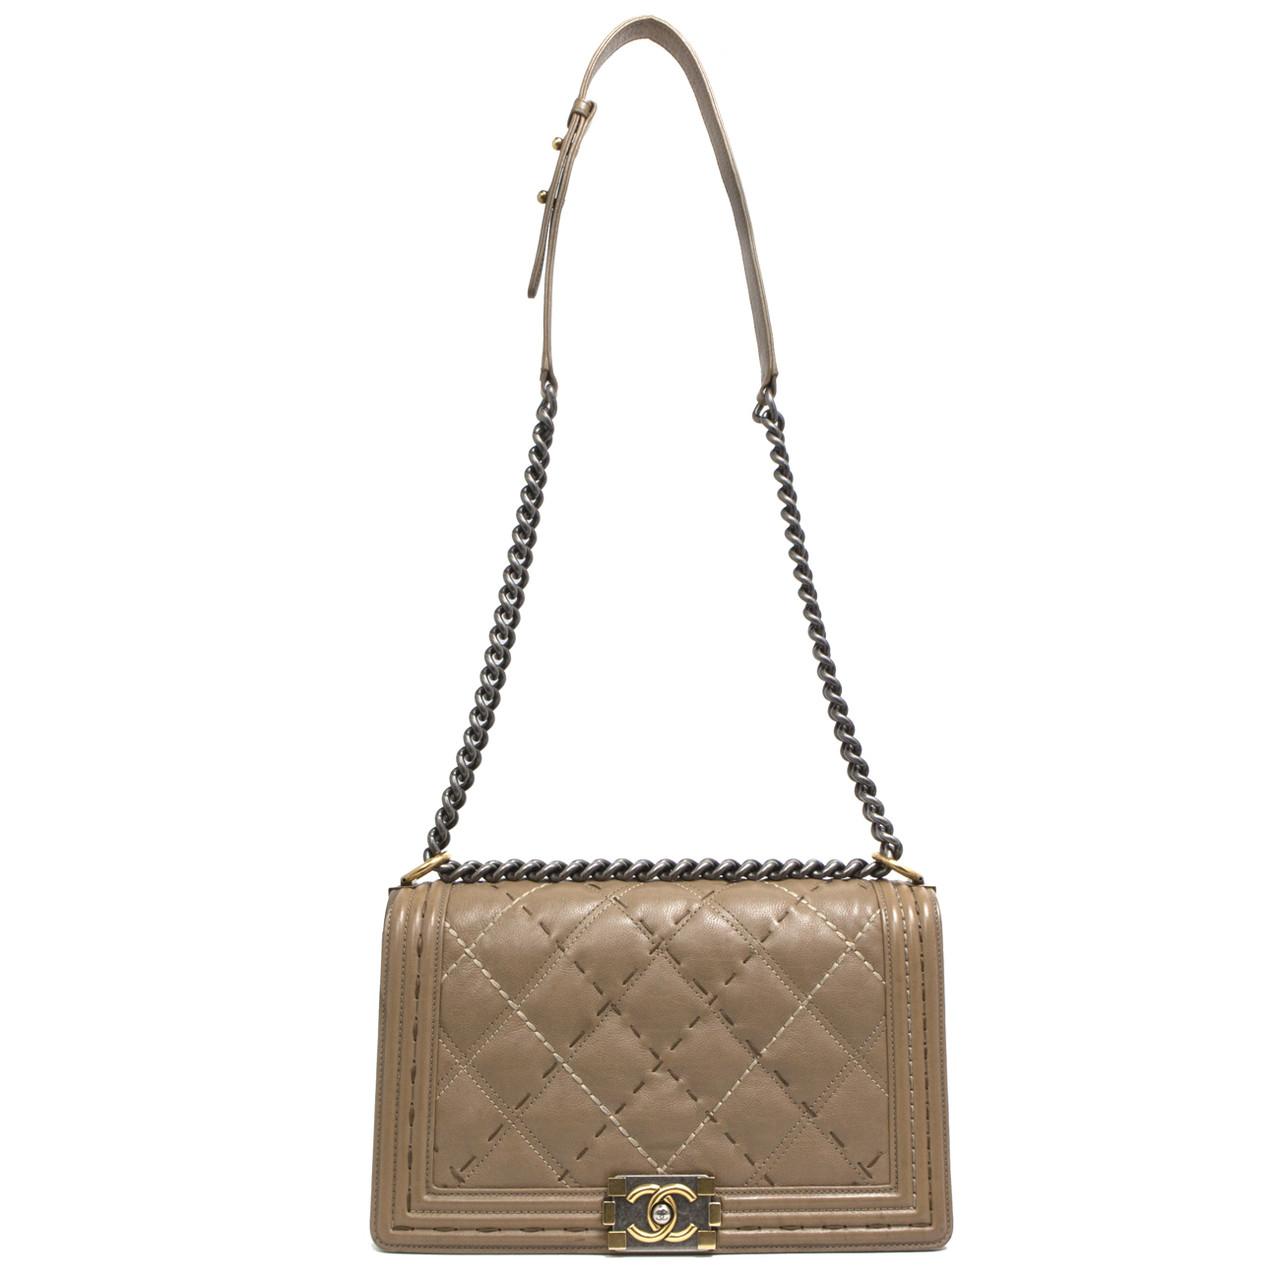 4c137a952eae Chanel Dark Beige Calfskin New Medium Double Stitch Boy Bag - modaselle